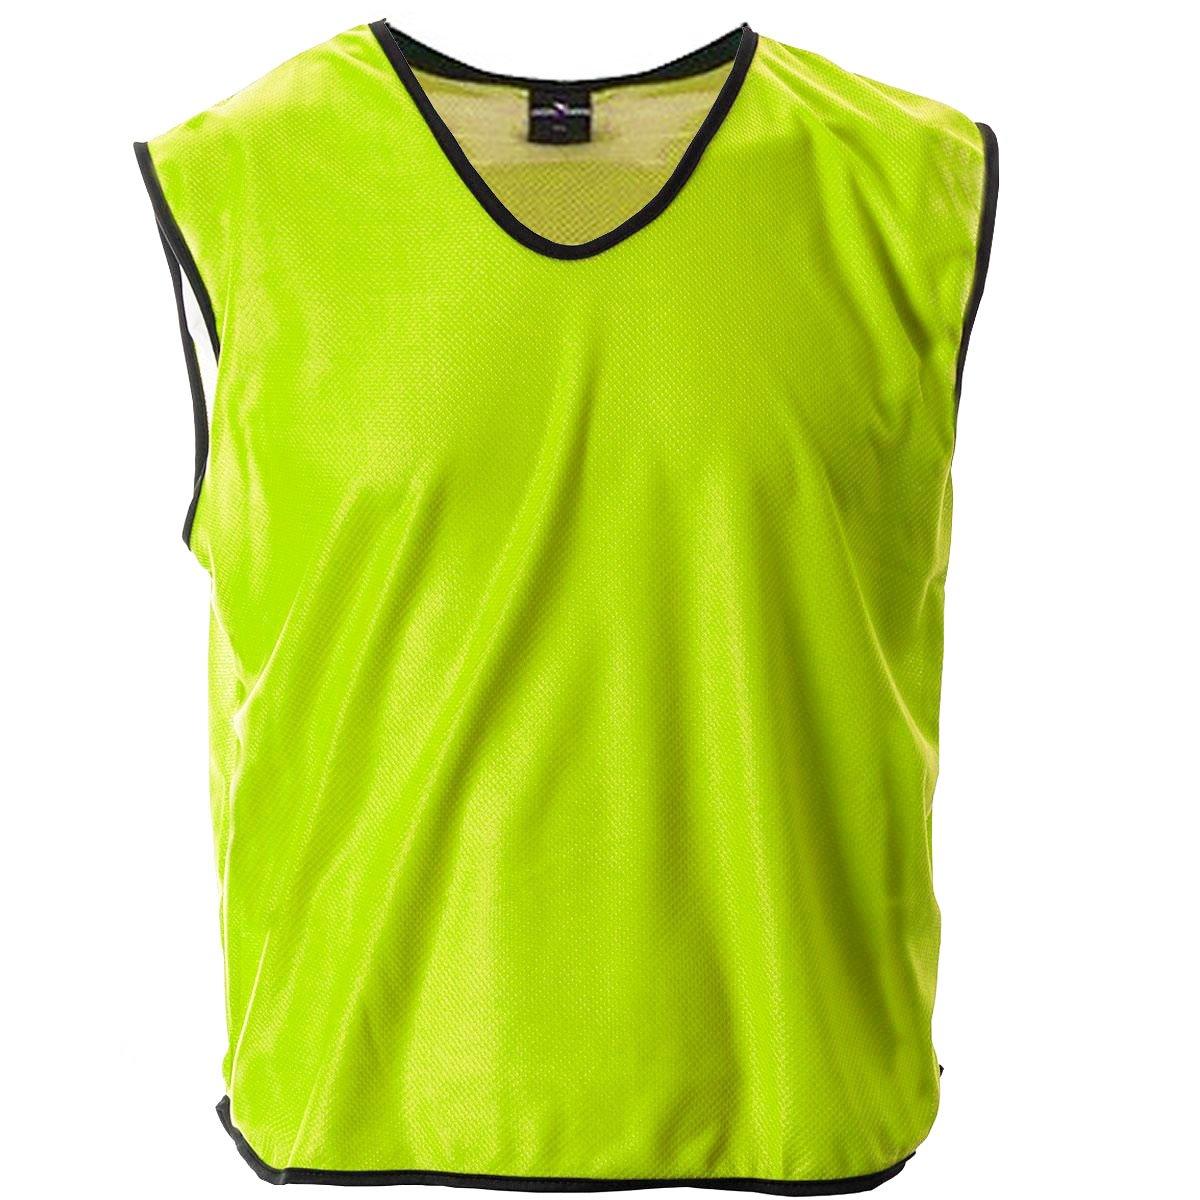 Mesh Football Rugby Sports Training Tank Top Sports Bib Yellow Cartasport